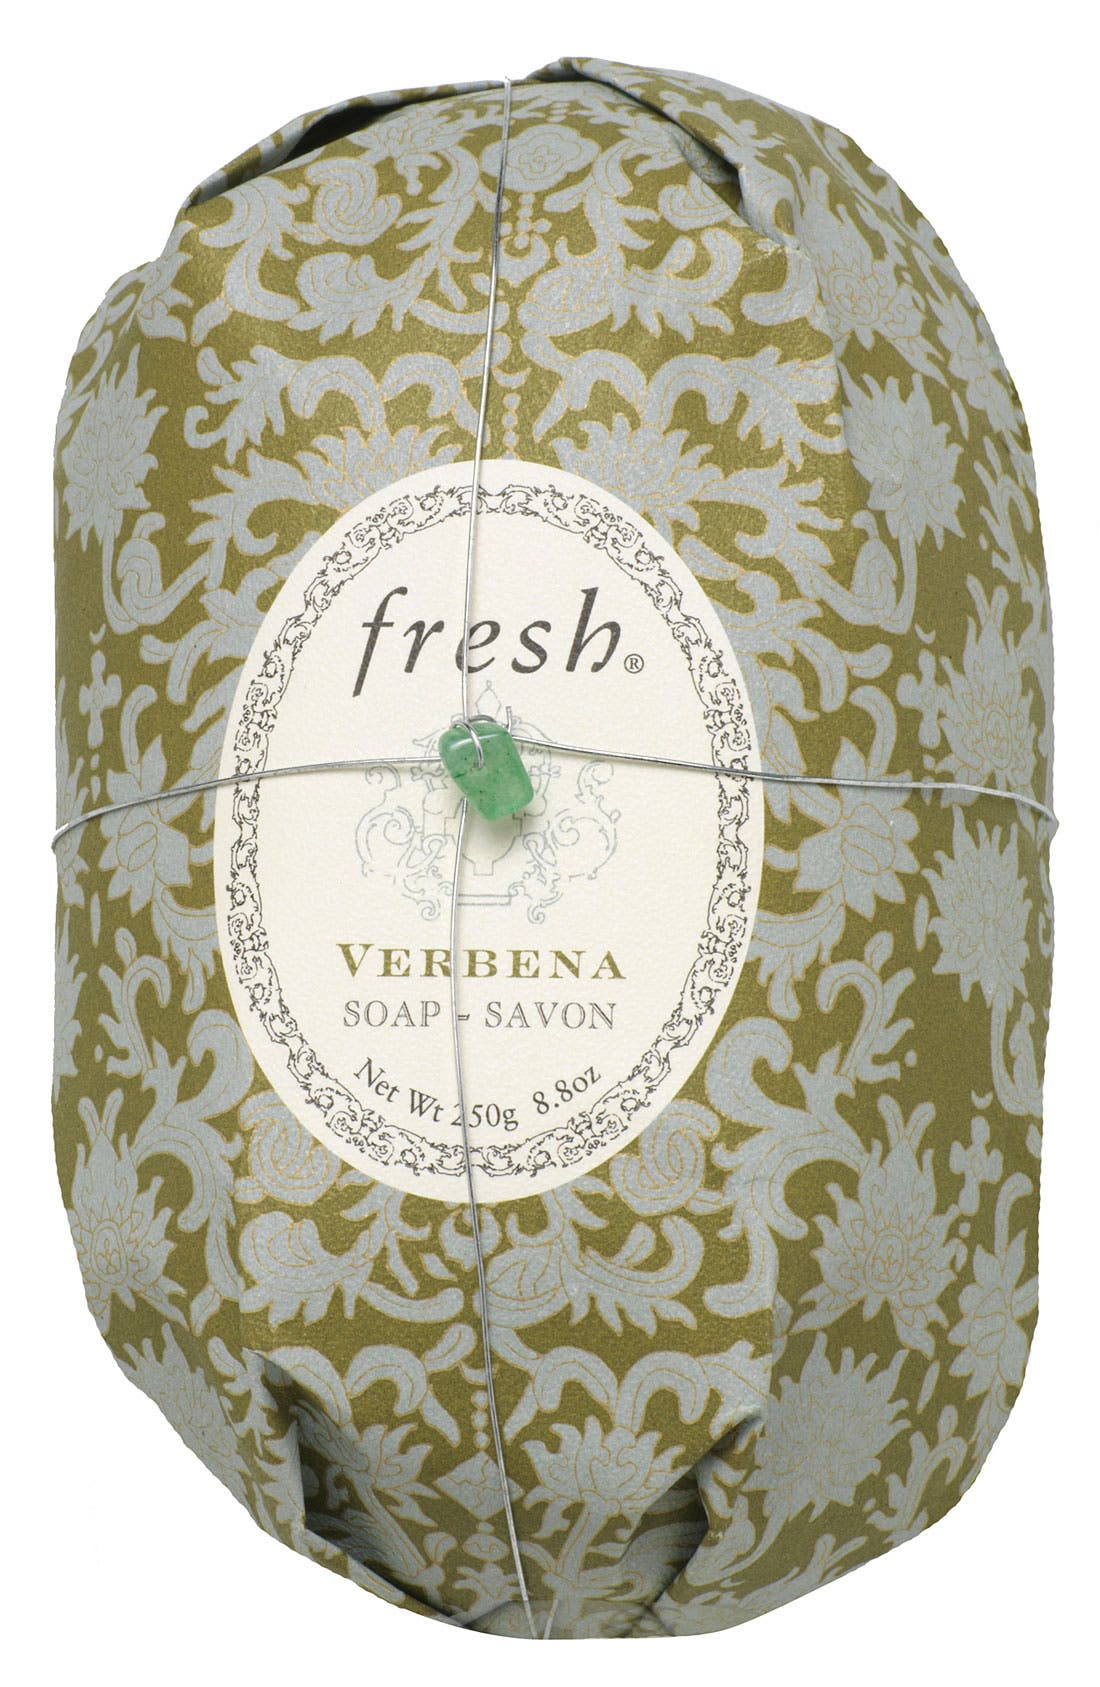 Fresh® 'Verbena' Oval Soap